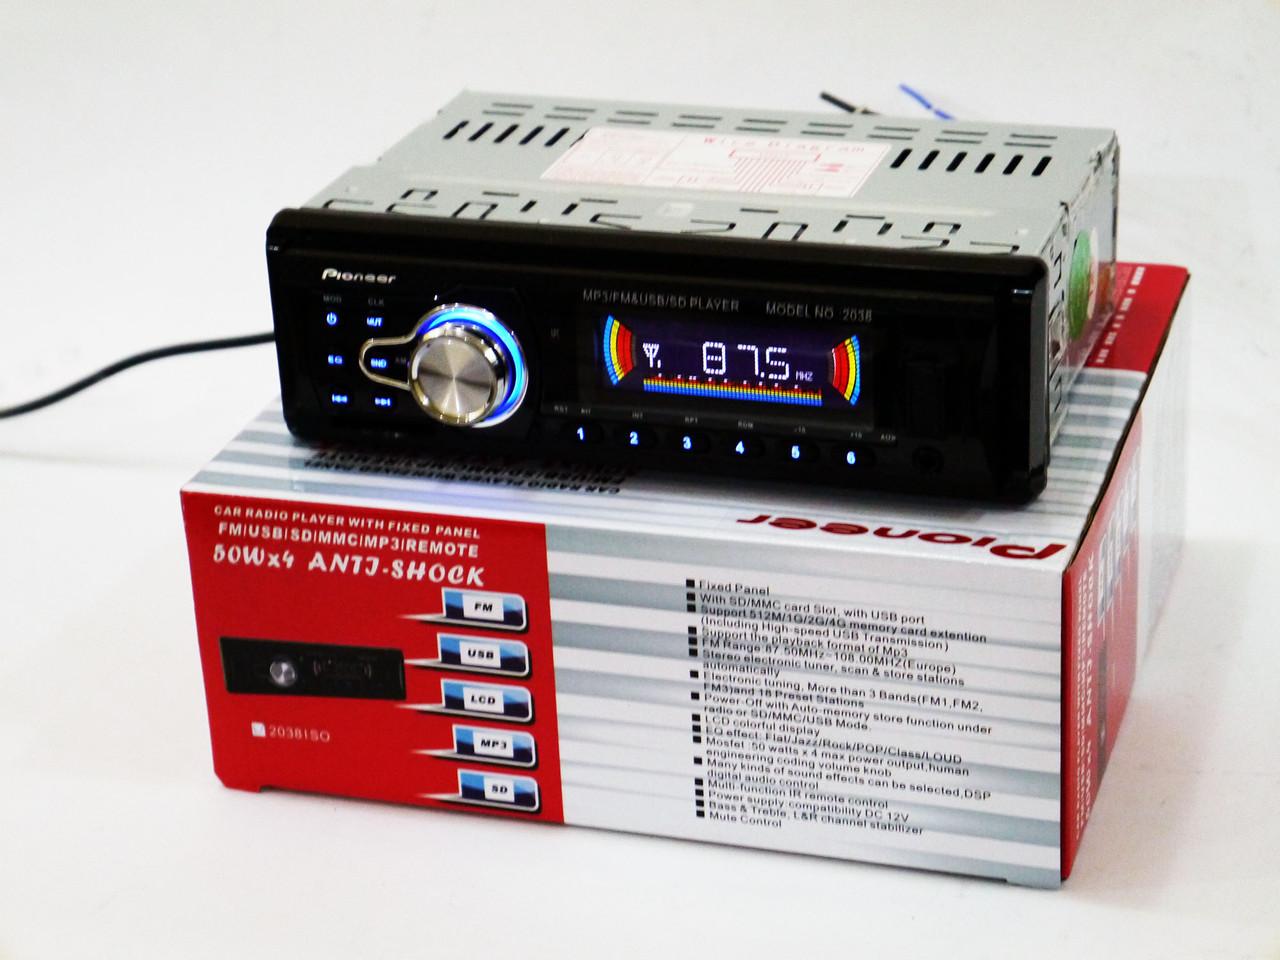 Автомагнитола Pioneer 2038 ISO USB+SD+FM+AUX+ пульт (4x50W)